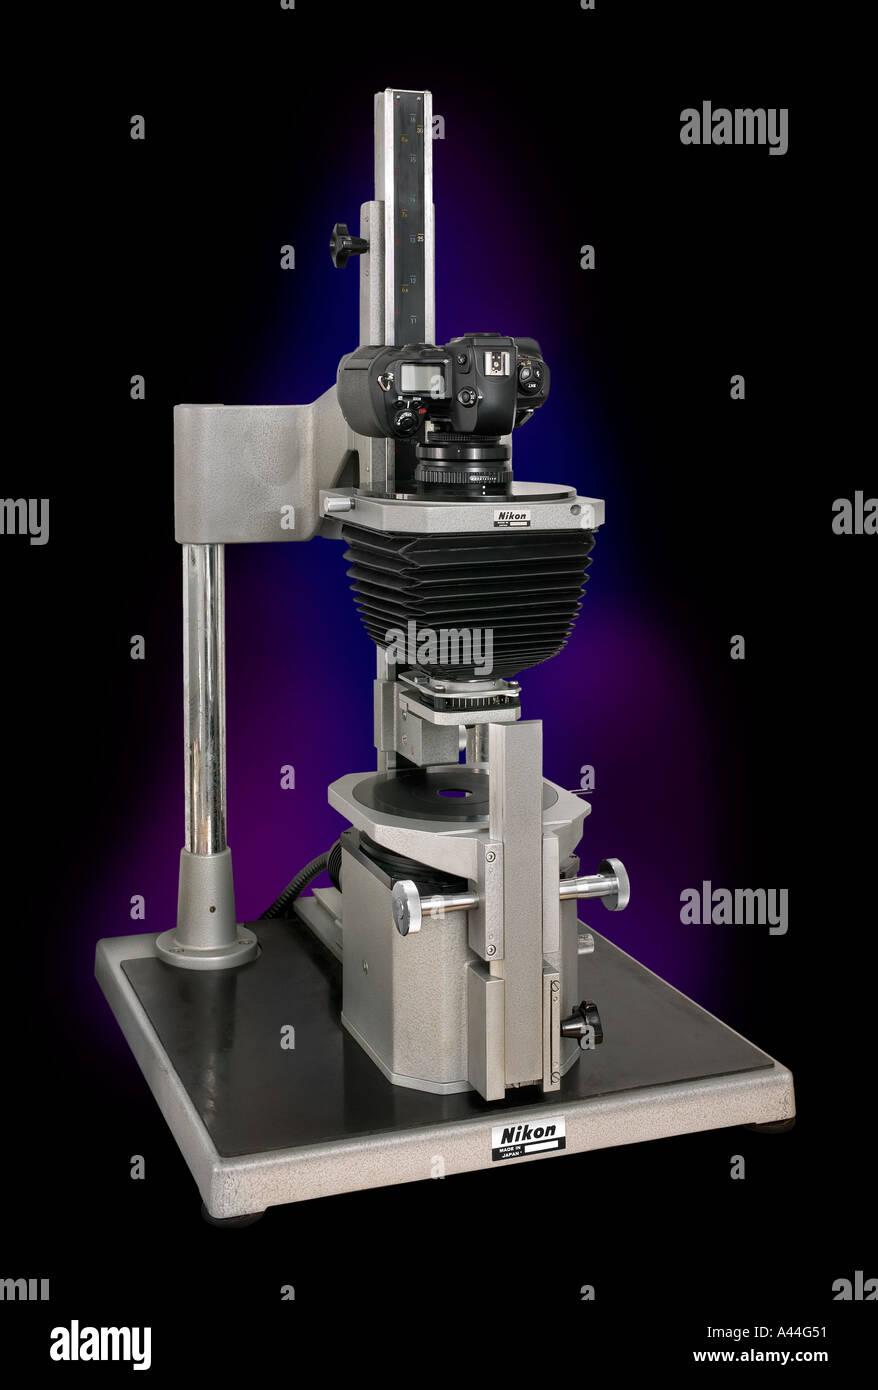 Nikon D1 Stock Photos Images Alamy Multiphot Macro System With Camera Trans Illuminator Back Lighting Image